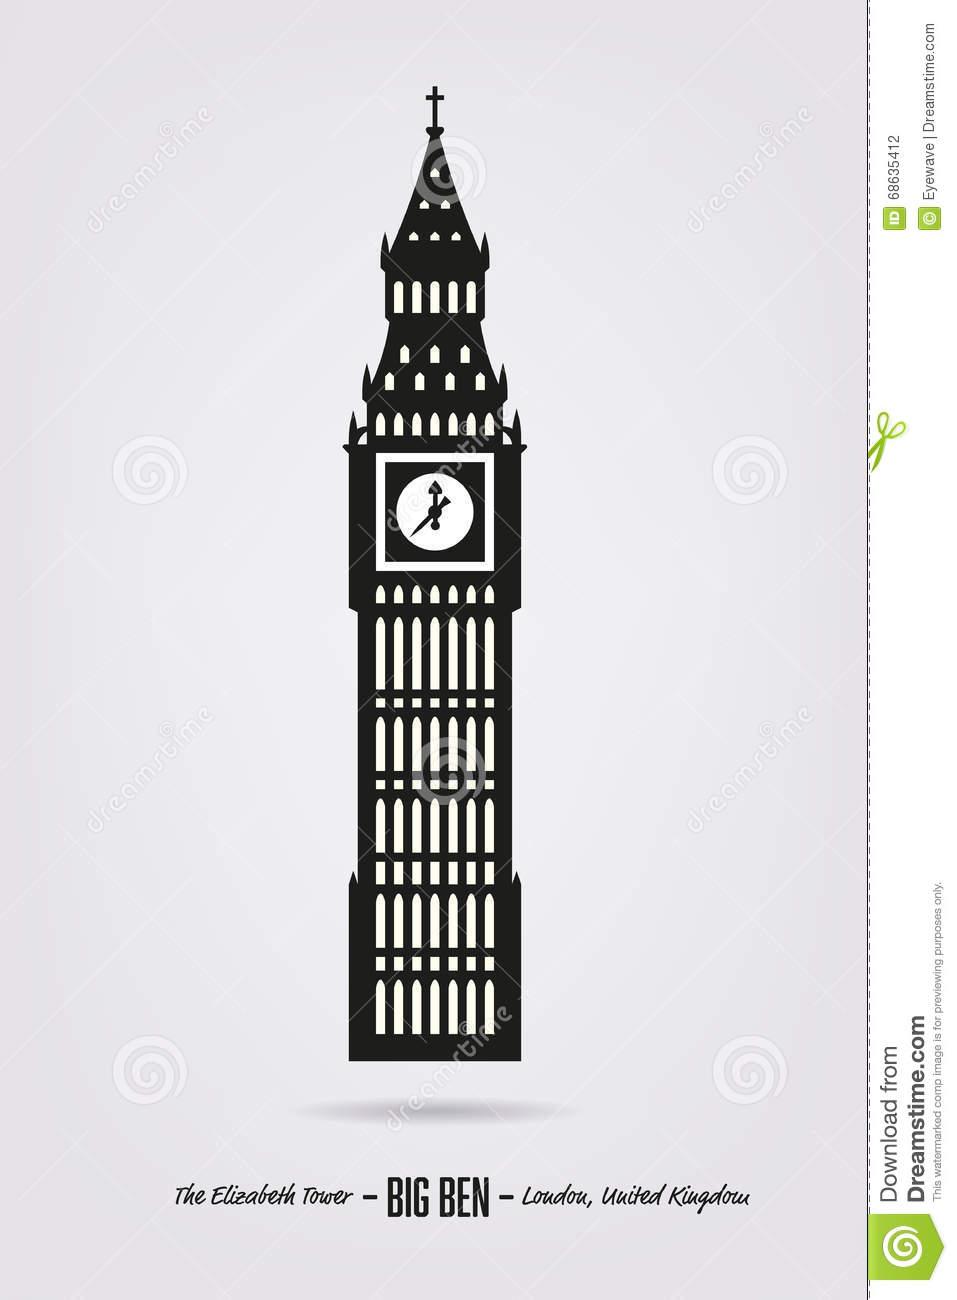 Big Ben, The Elizabeth Tower At London Stock Vector.